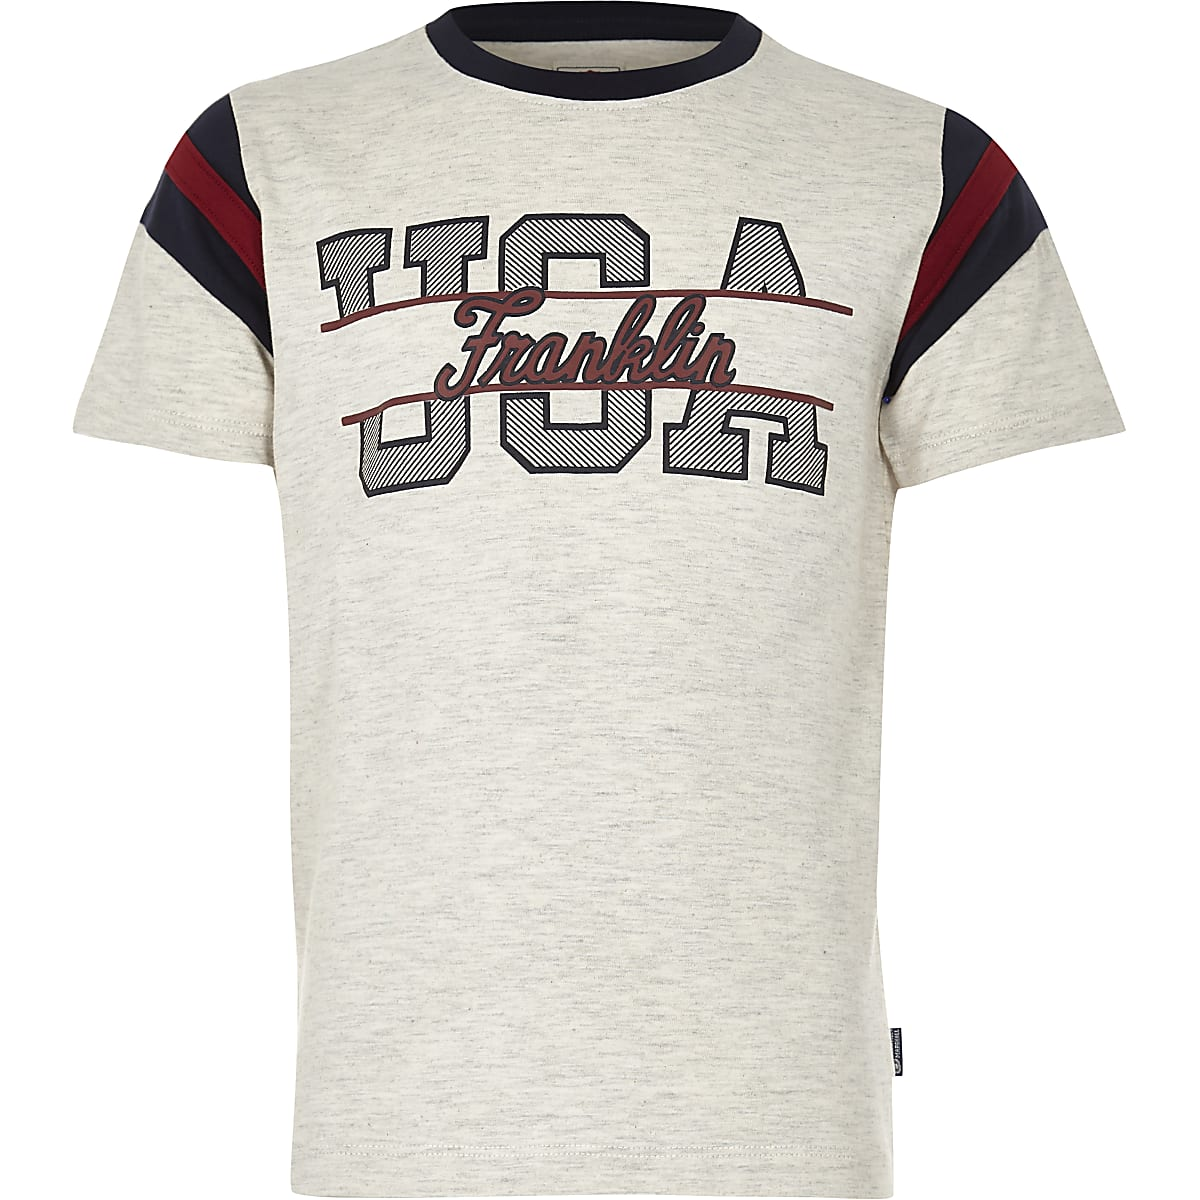 Boys Franklin & Marshall marl 'USA' T-shirt